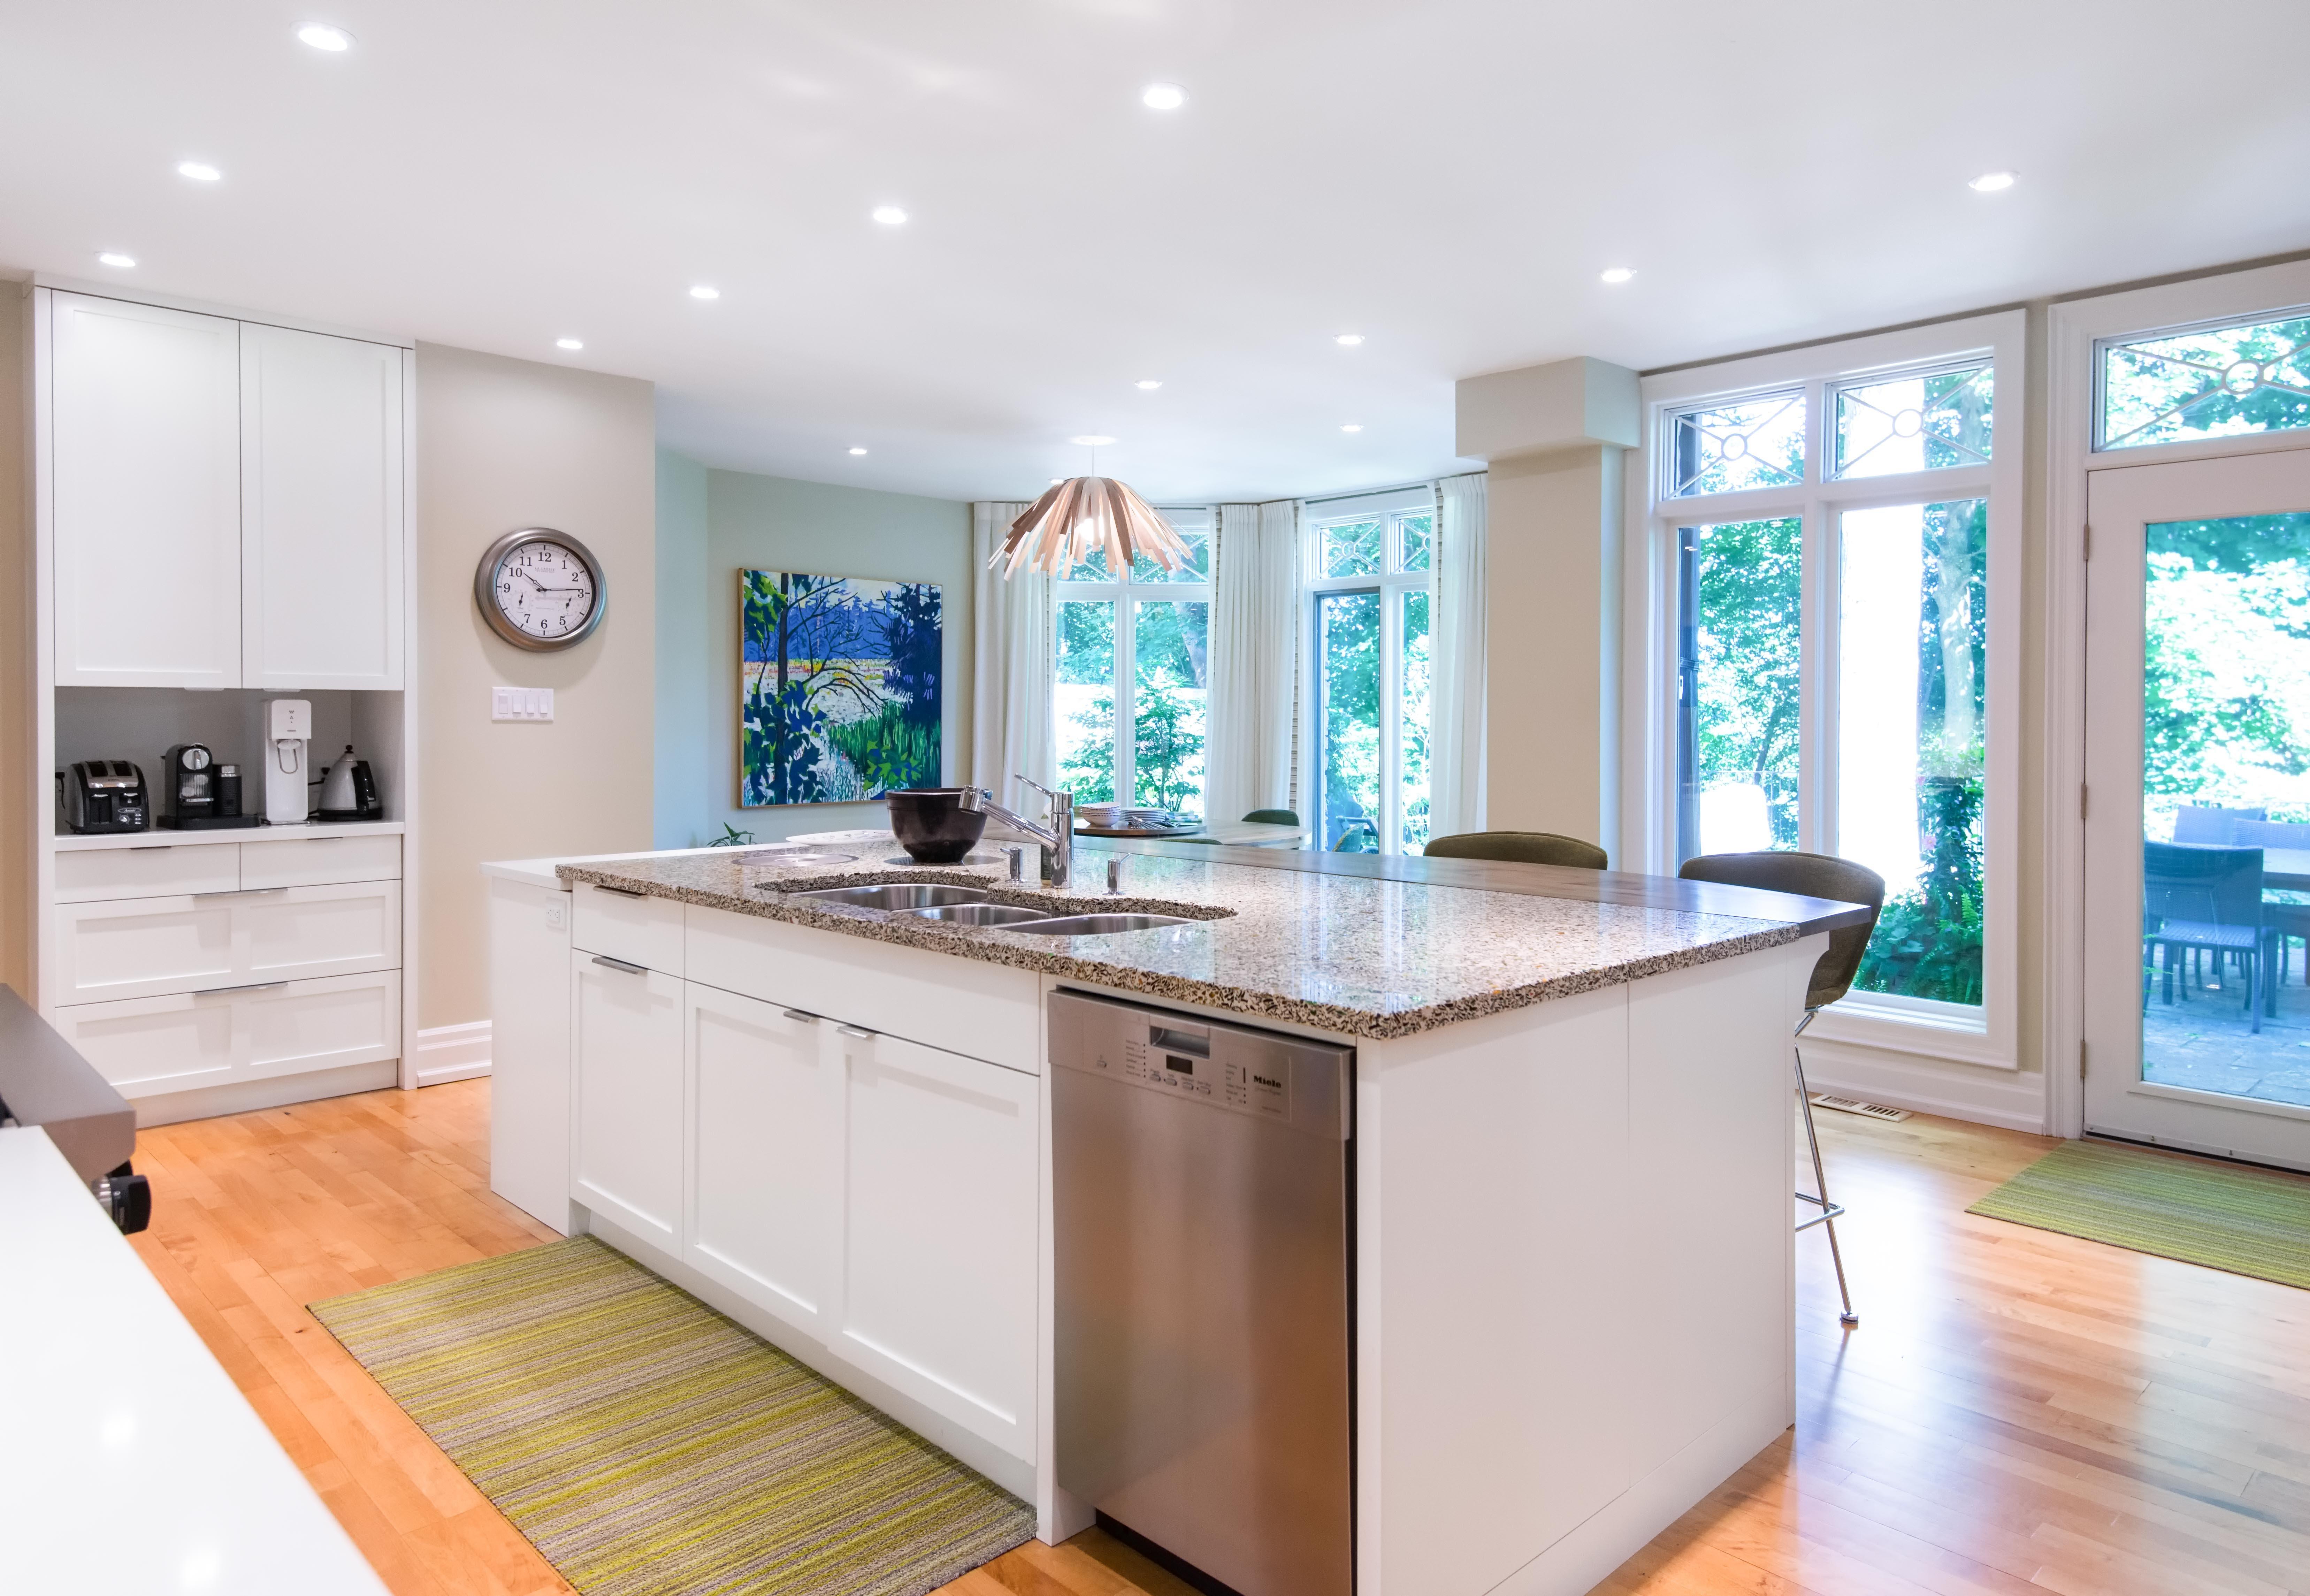 Catherine-friis-toronto-design-vetrazzo-recycled-glass-countertops-alehouse-amber(1)